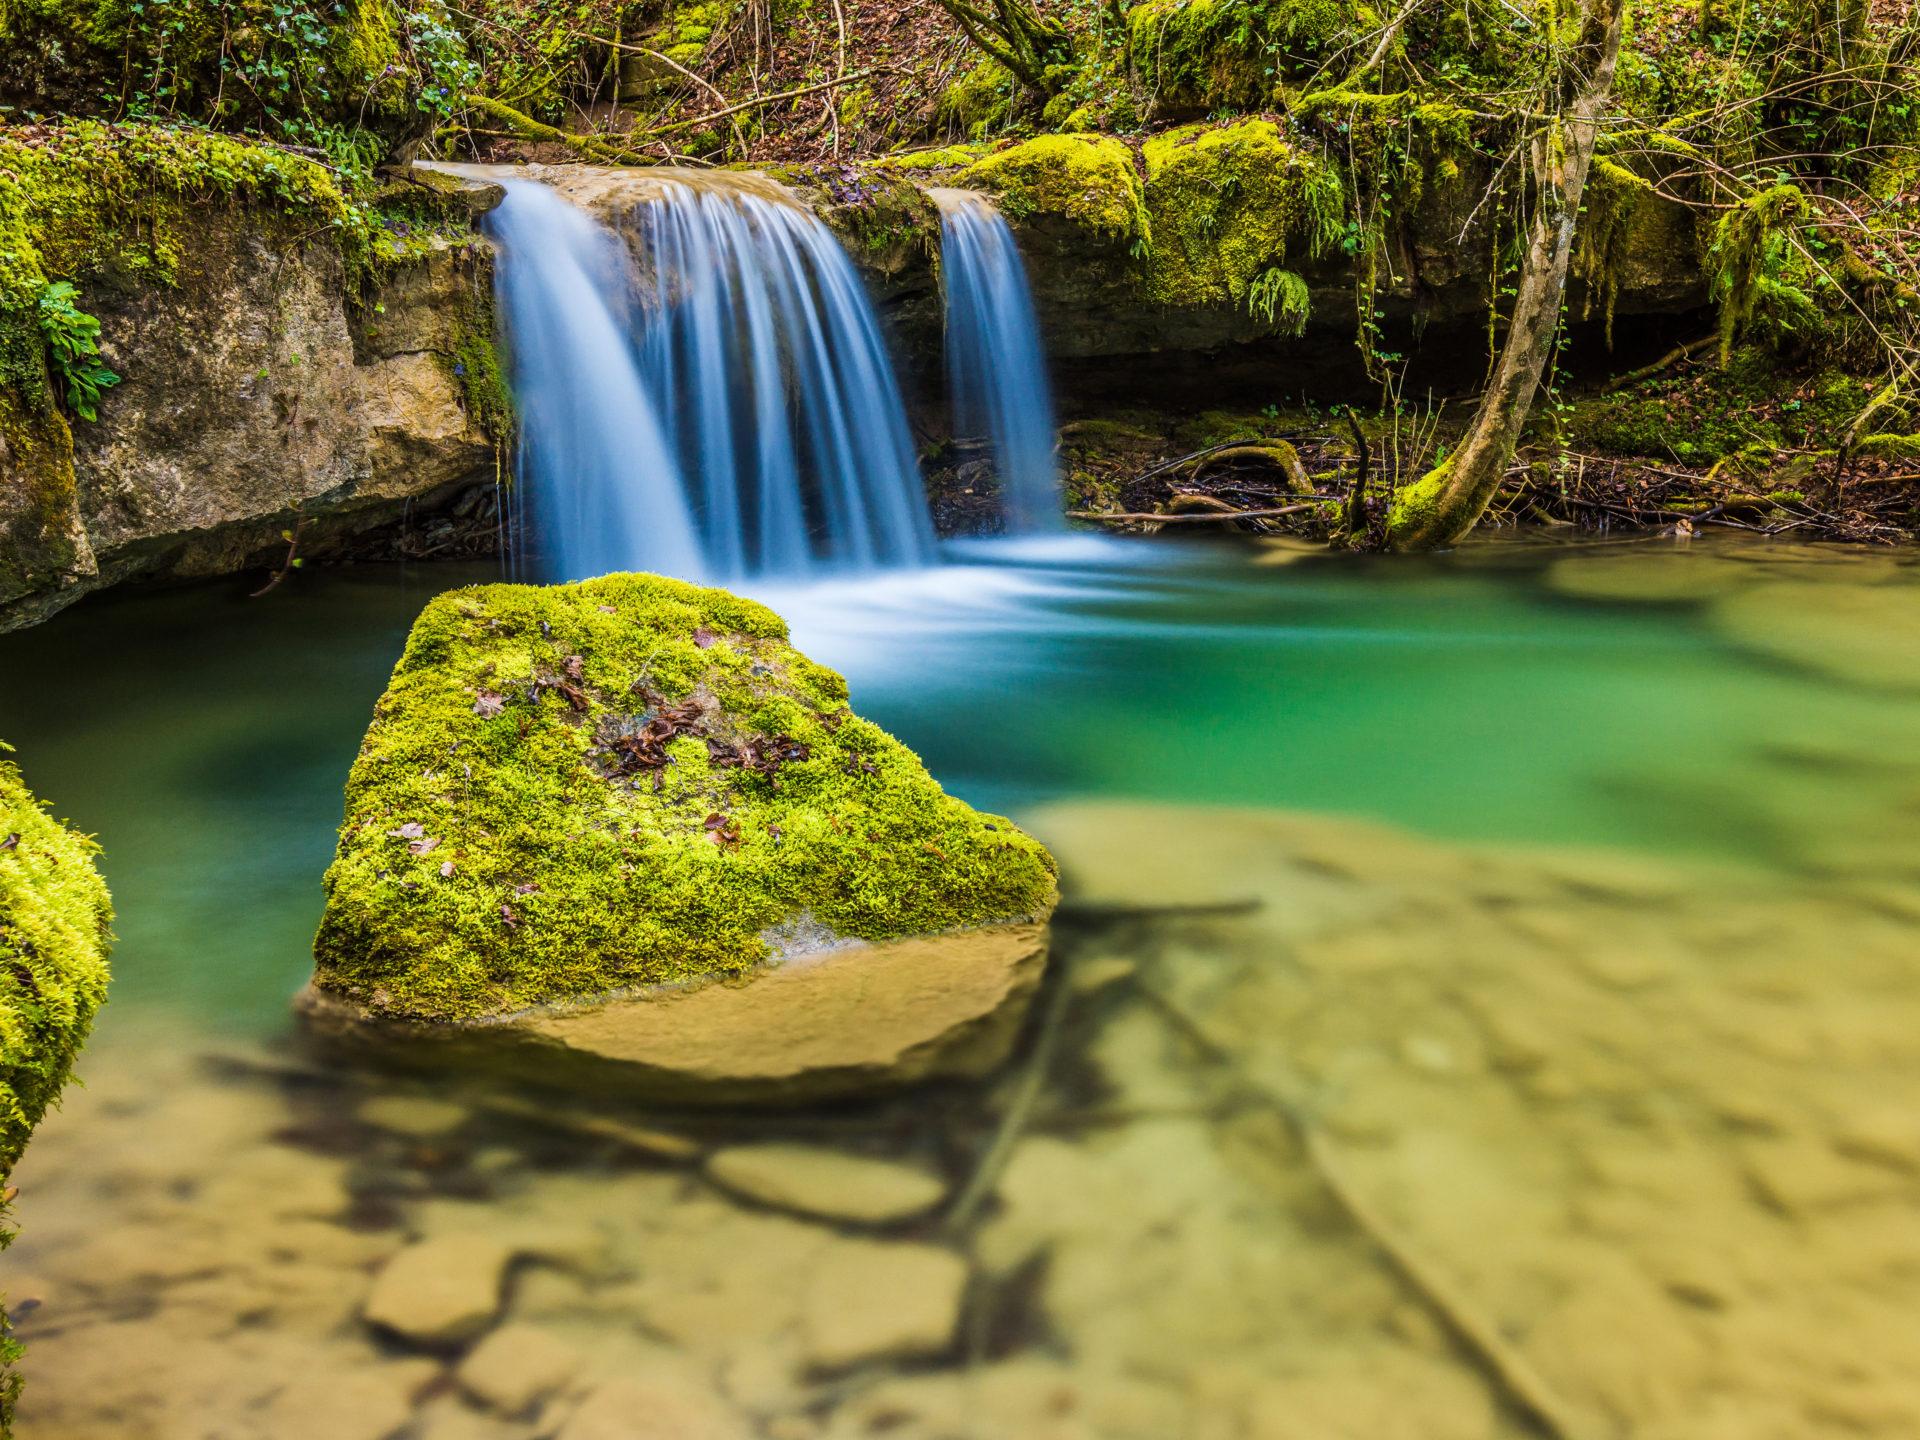 Waterfall Desktop Wallpaper Hd Nice Small Waterfall Clear Water Rocks With Moss Hd